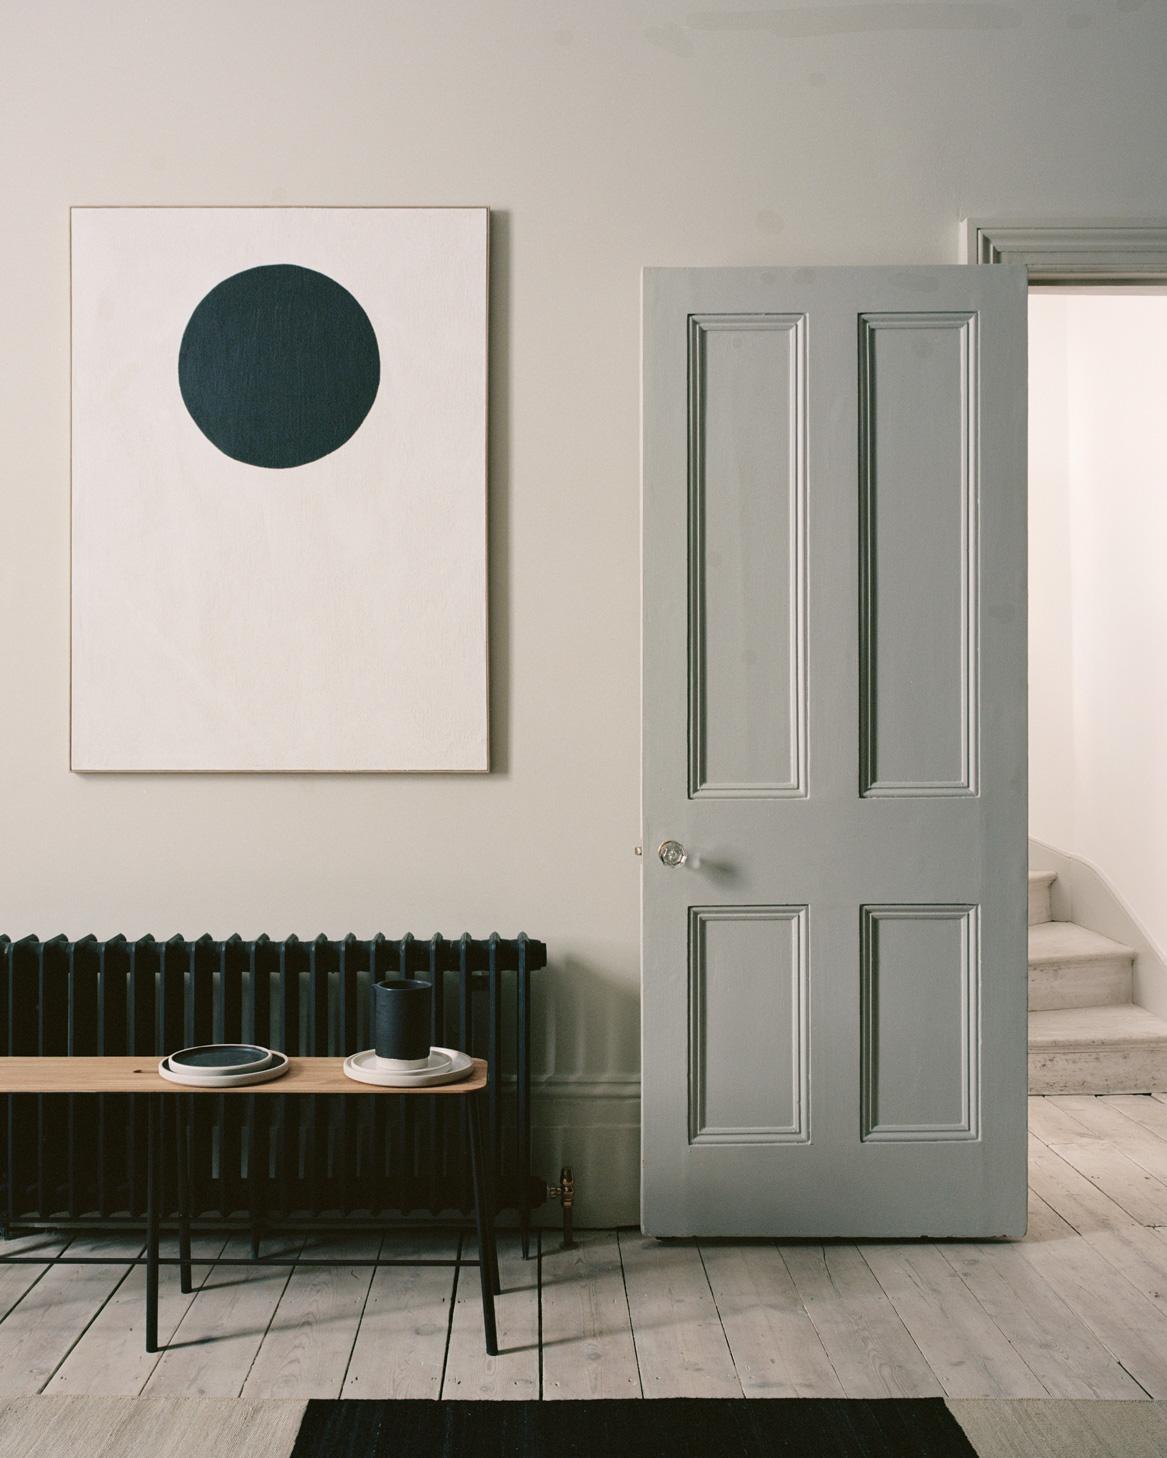 House_of_Grey_Exhibition_dark_radiator_graphic_art.jpg